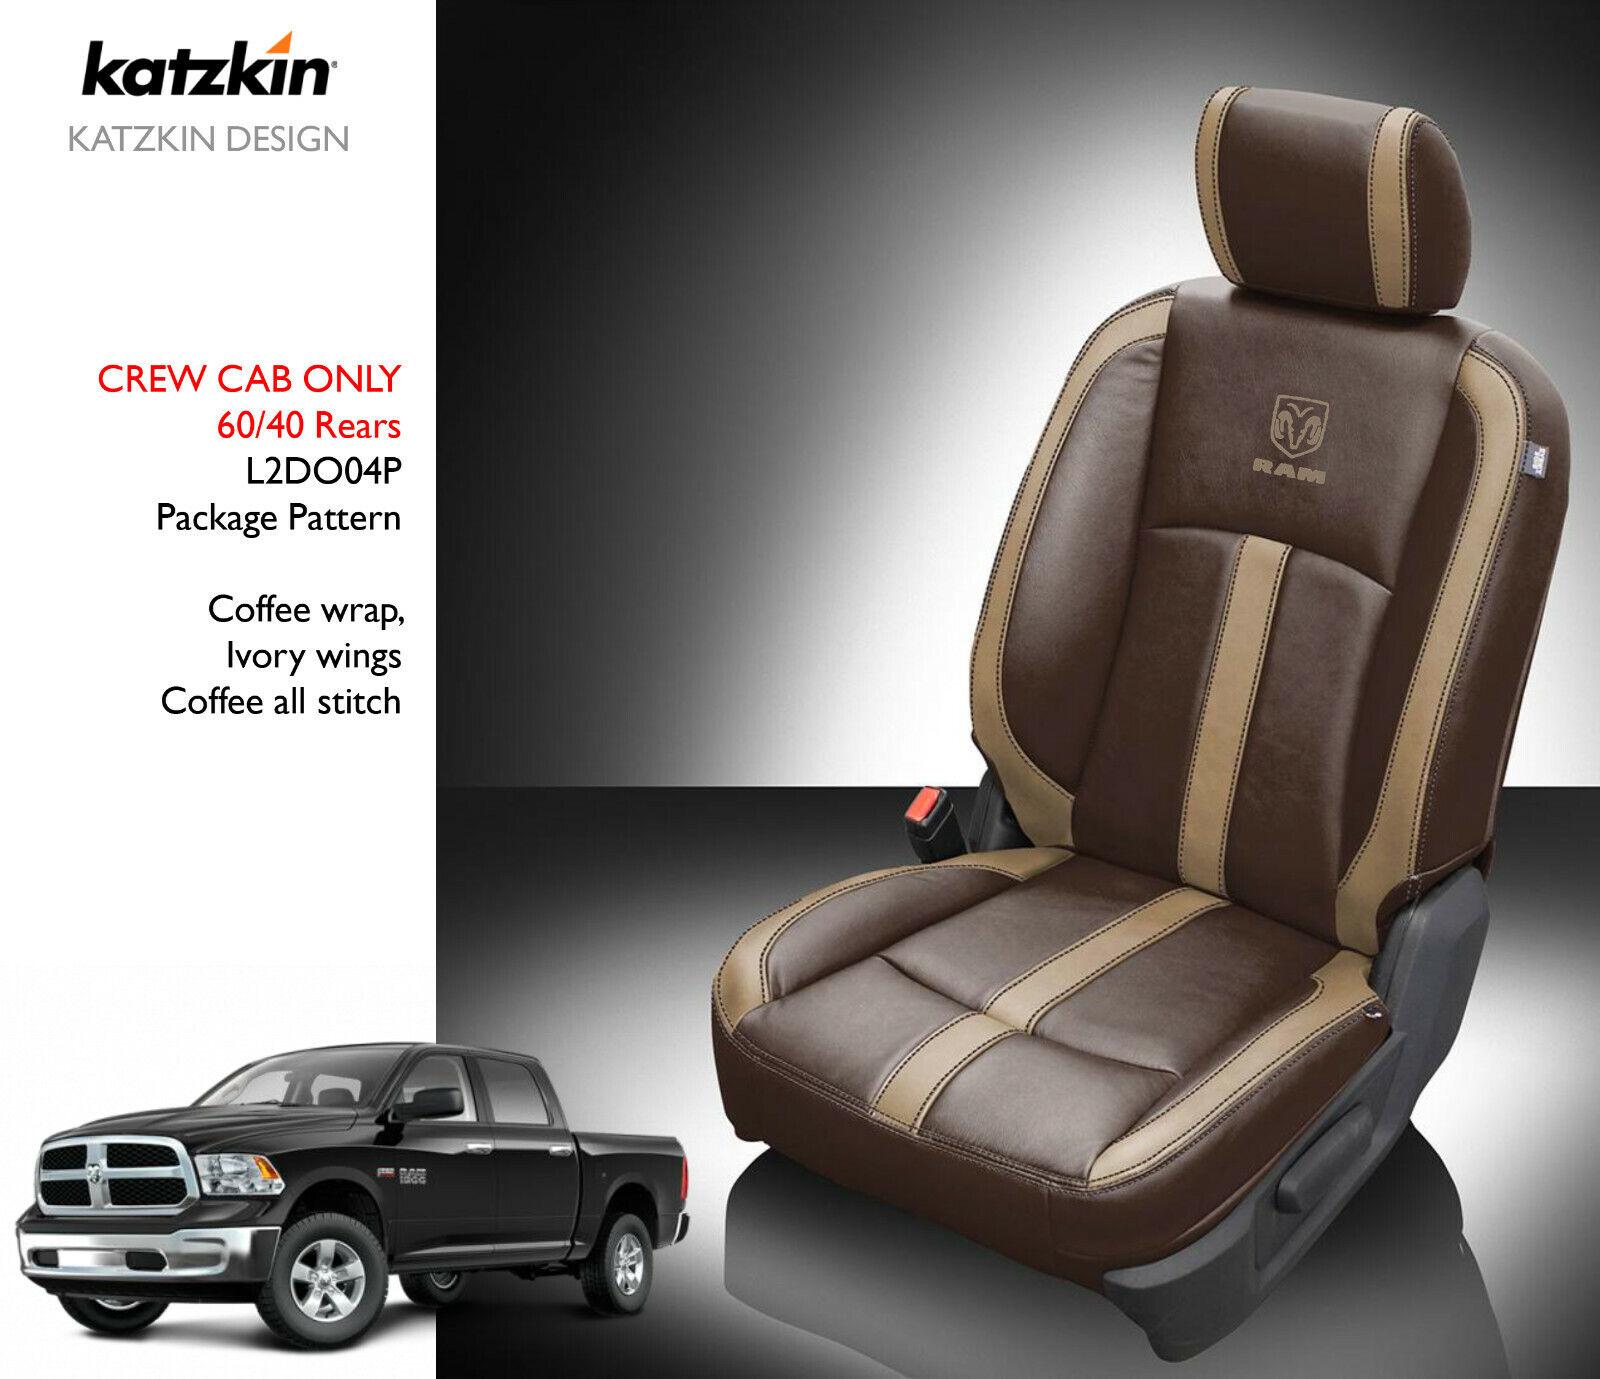 13 18 Dodge Ram Crew Cab Katzkin Black And Diesel Gray Leather Seat Covers Logos Ebay